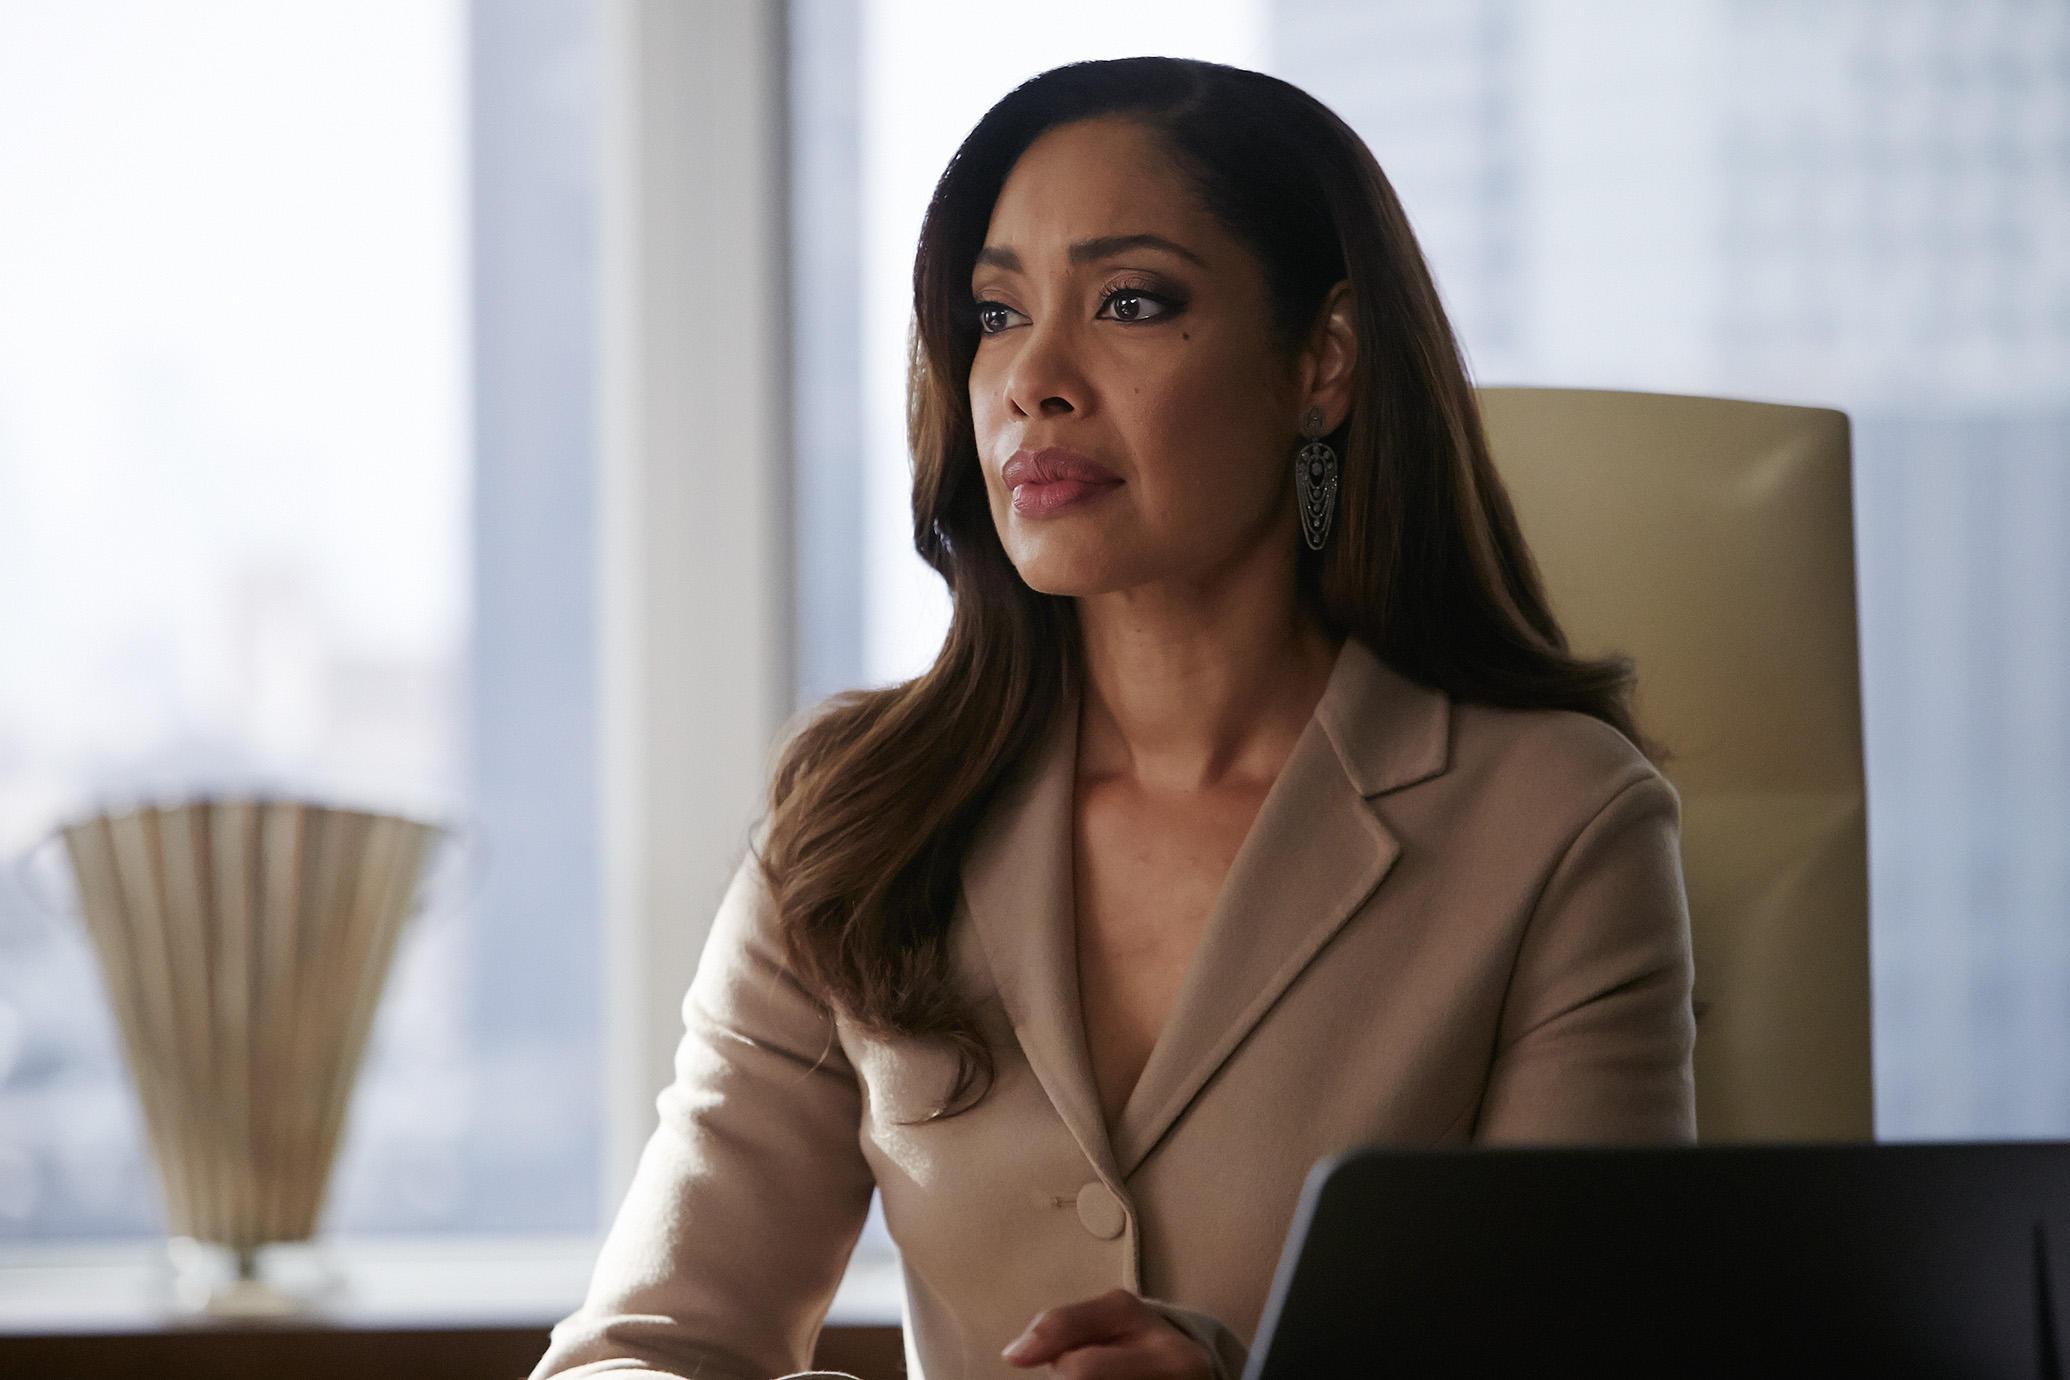 Gina Torres sits at a desk